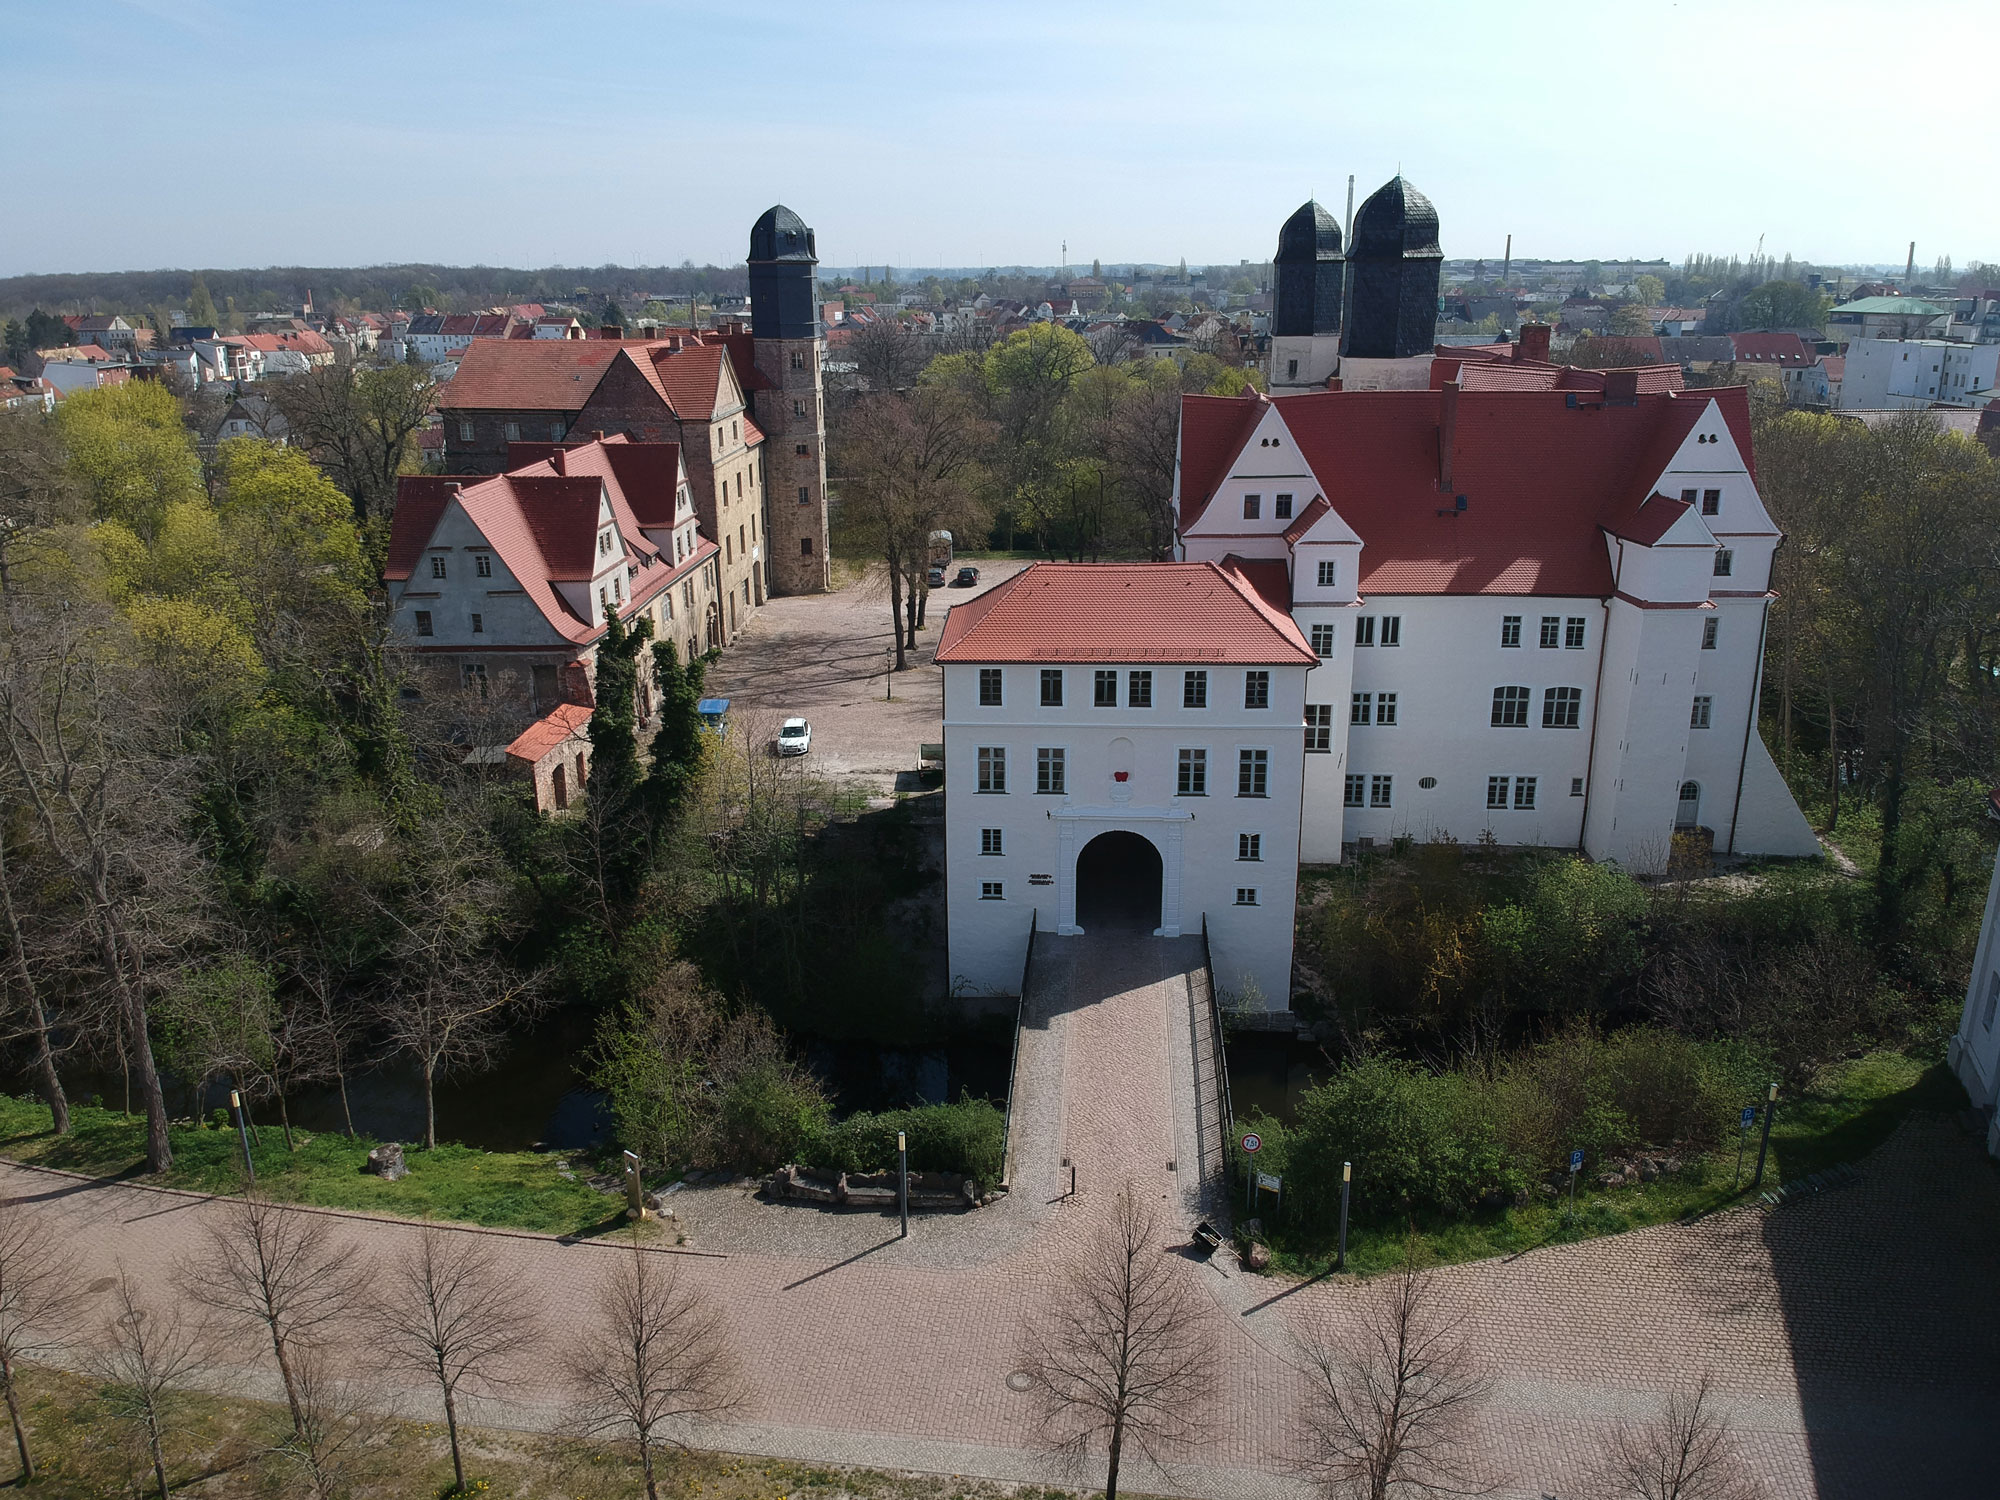 Halle-Dessau - Museen im Schloss Köthen